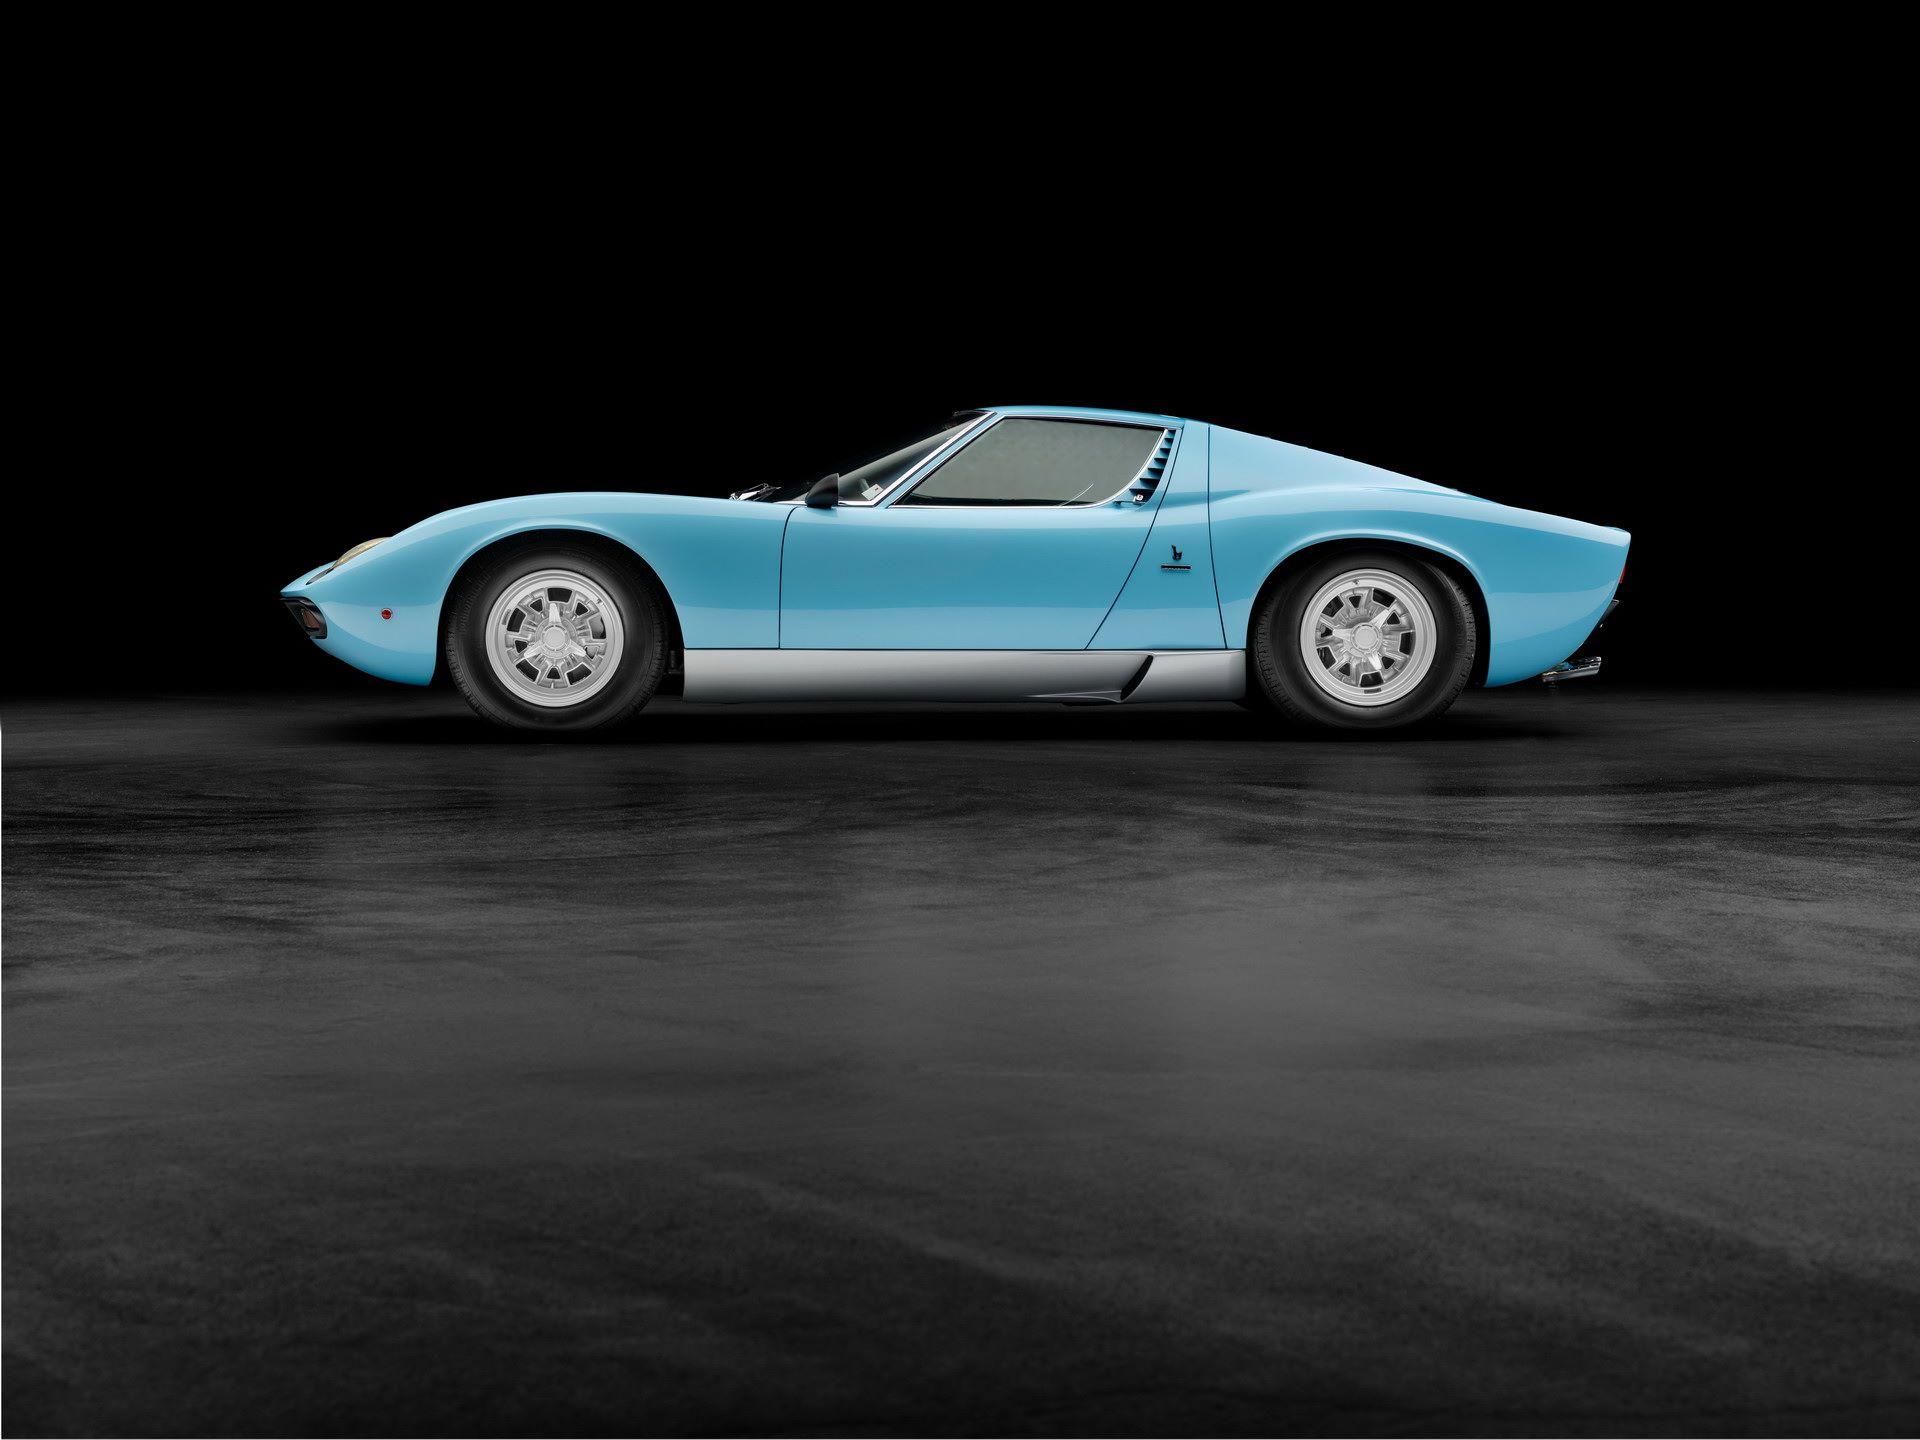 Lamborghini-Miura-SV-turns-50-5